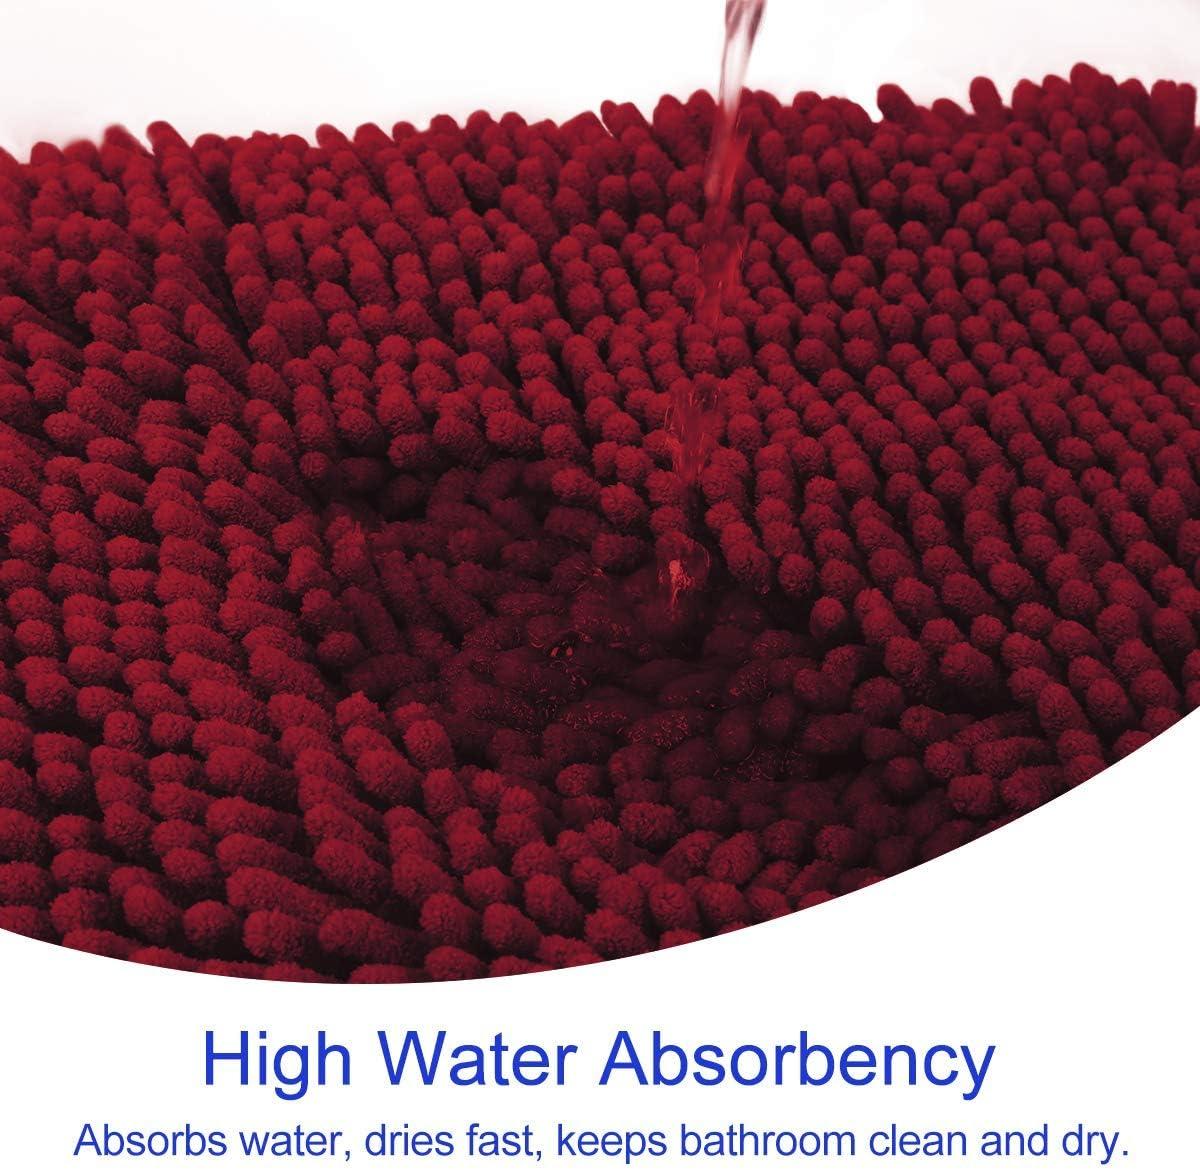 Shower Absorbent Shaggy Bath Rugs /& Slip Resistant Plush Carpets Mats for Tub Bathroom Luxury Soft Chenille Bath Mats Set HOMEIDEAS 2 Pieces Bathroom Rugs Set Grey